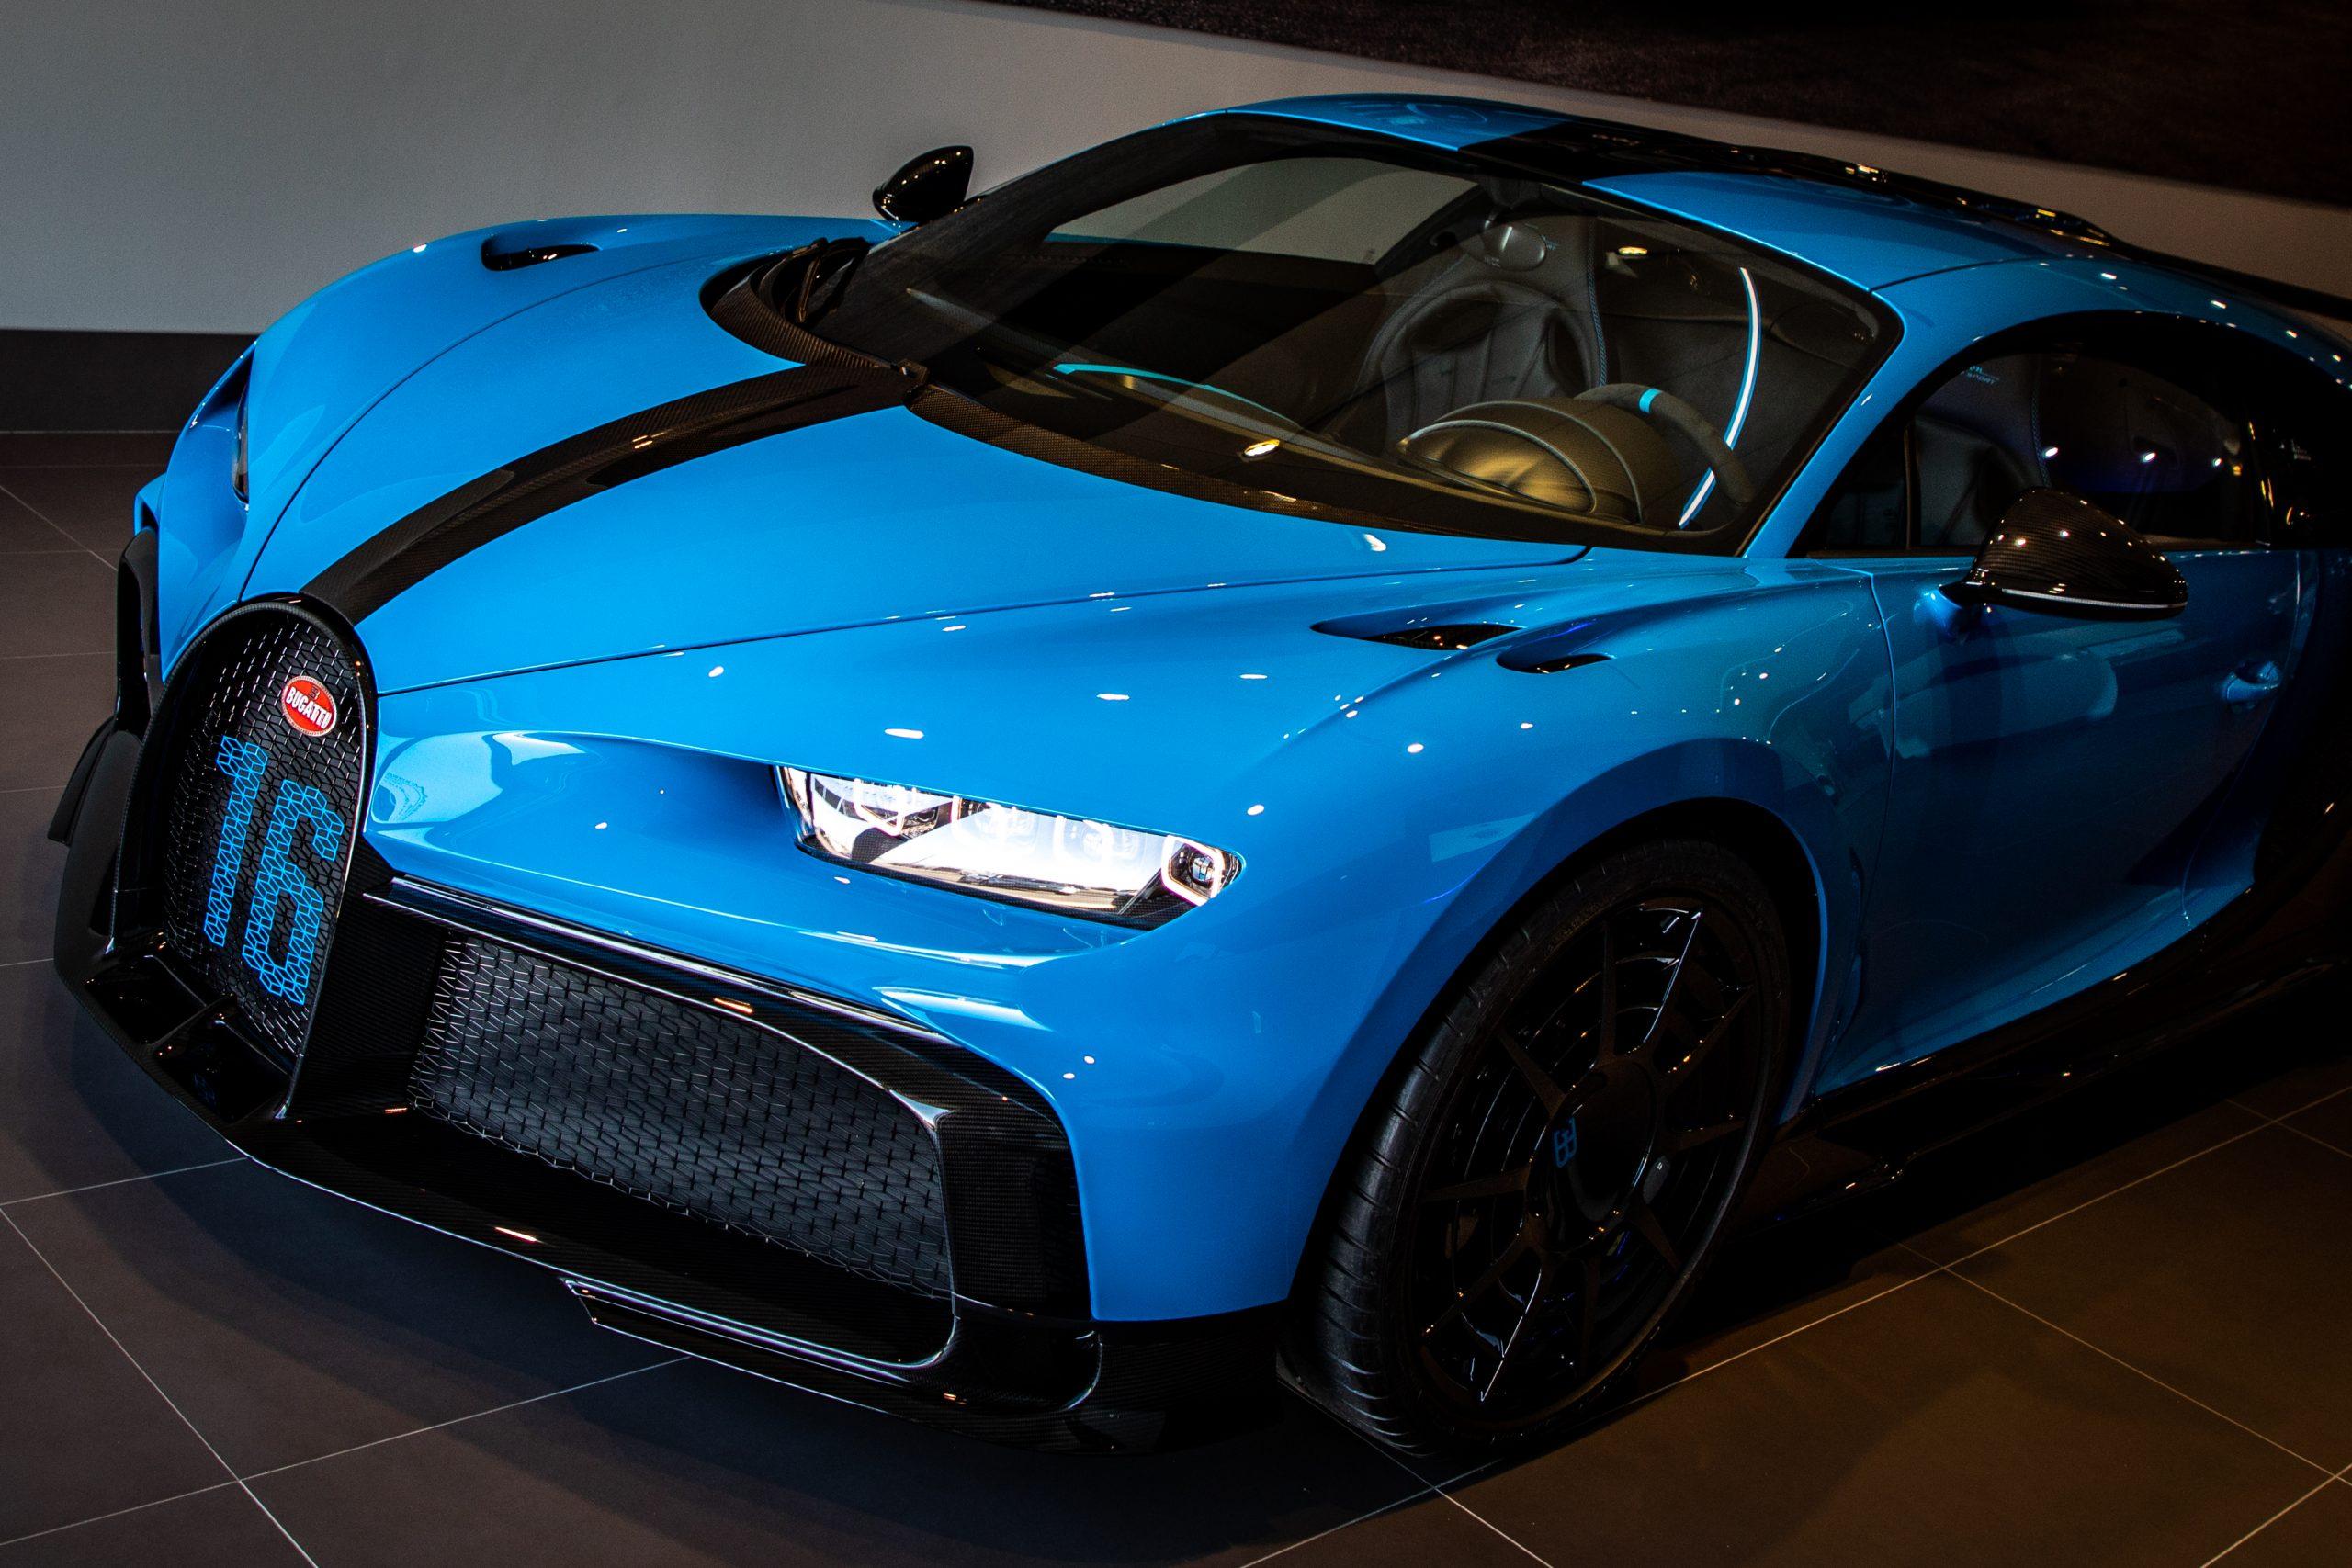 Bugatti-Chiron-Pur-Sport-show-car-12